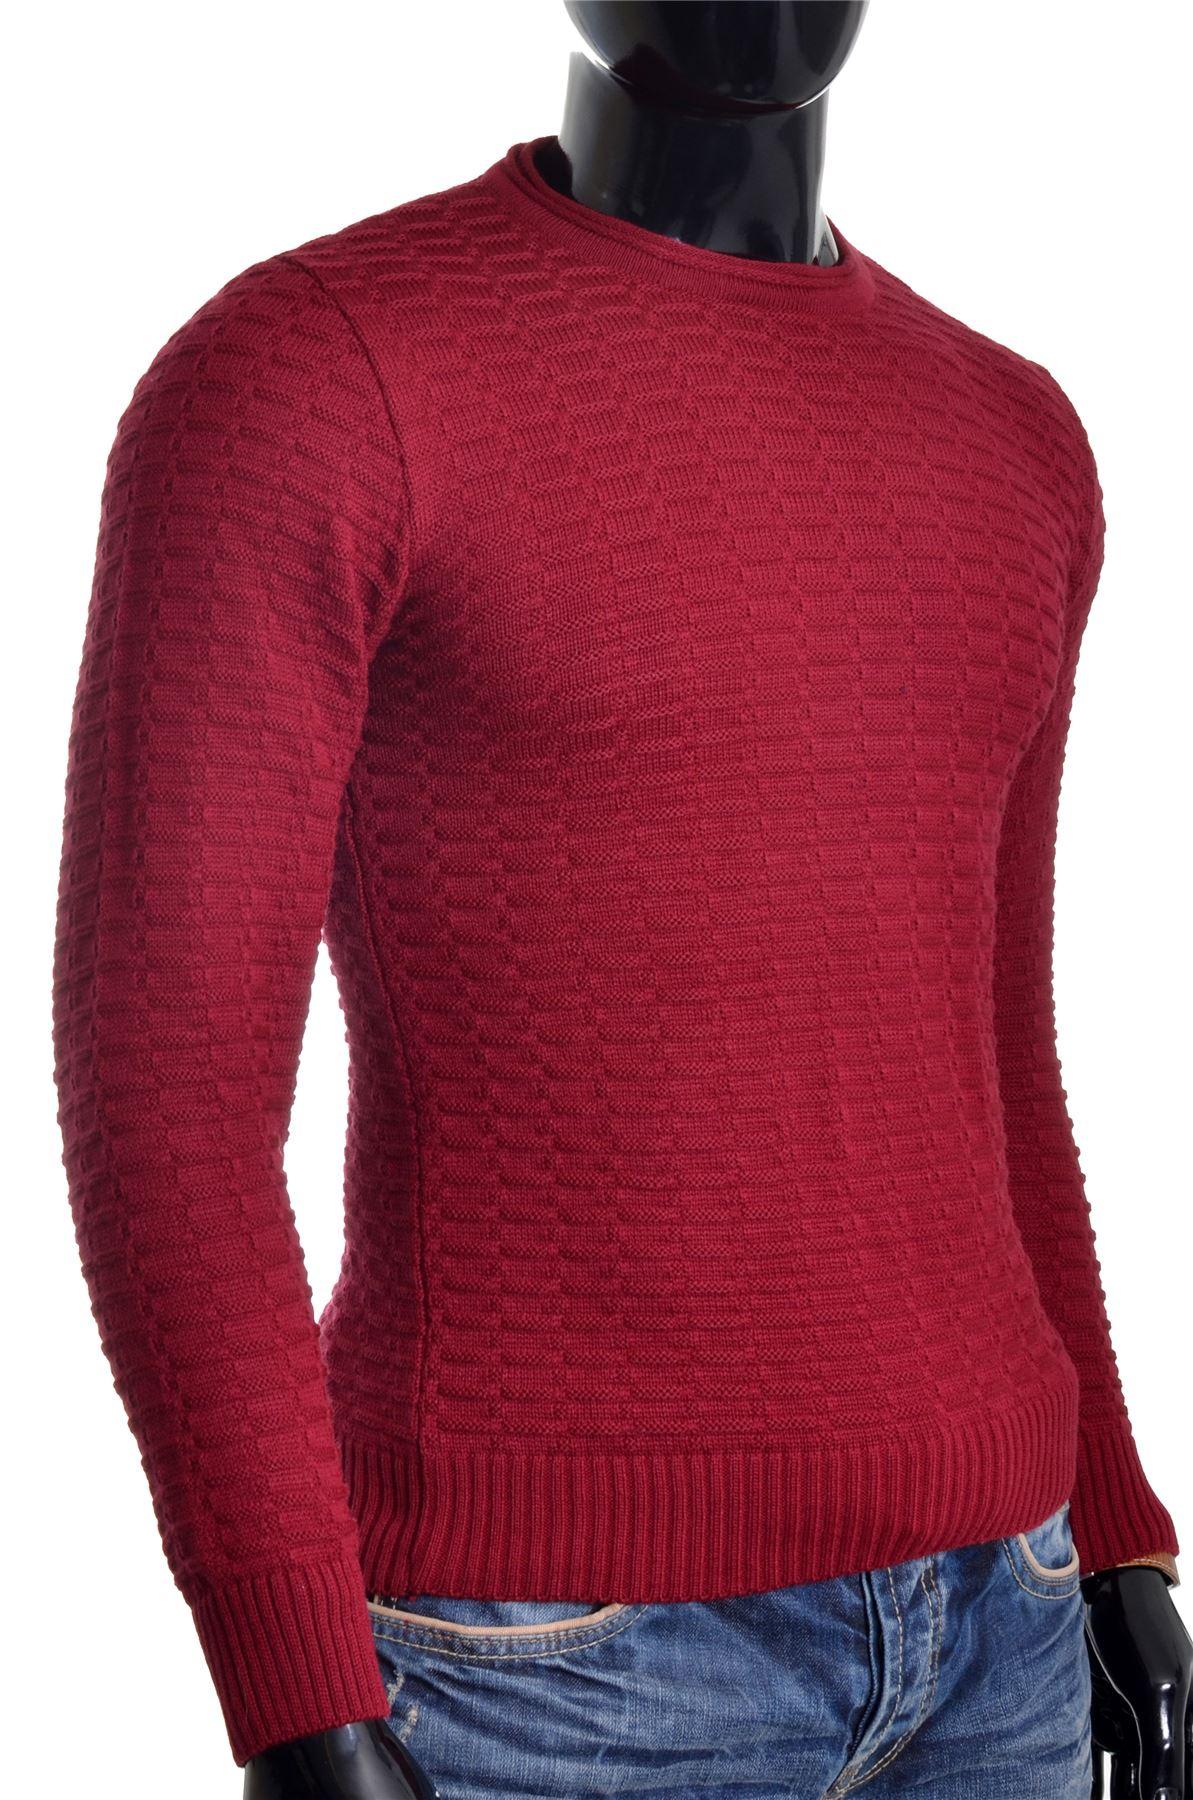 Men-039-s-Jumper-Striped-Knit-Smart-Long-Sleeve-Sweater-Crew-Neck-Top-Slim-Fitness thumbnail 4